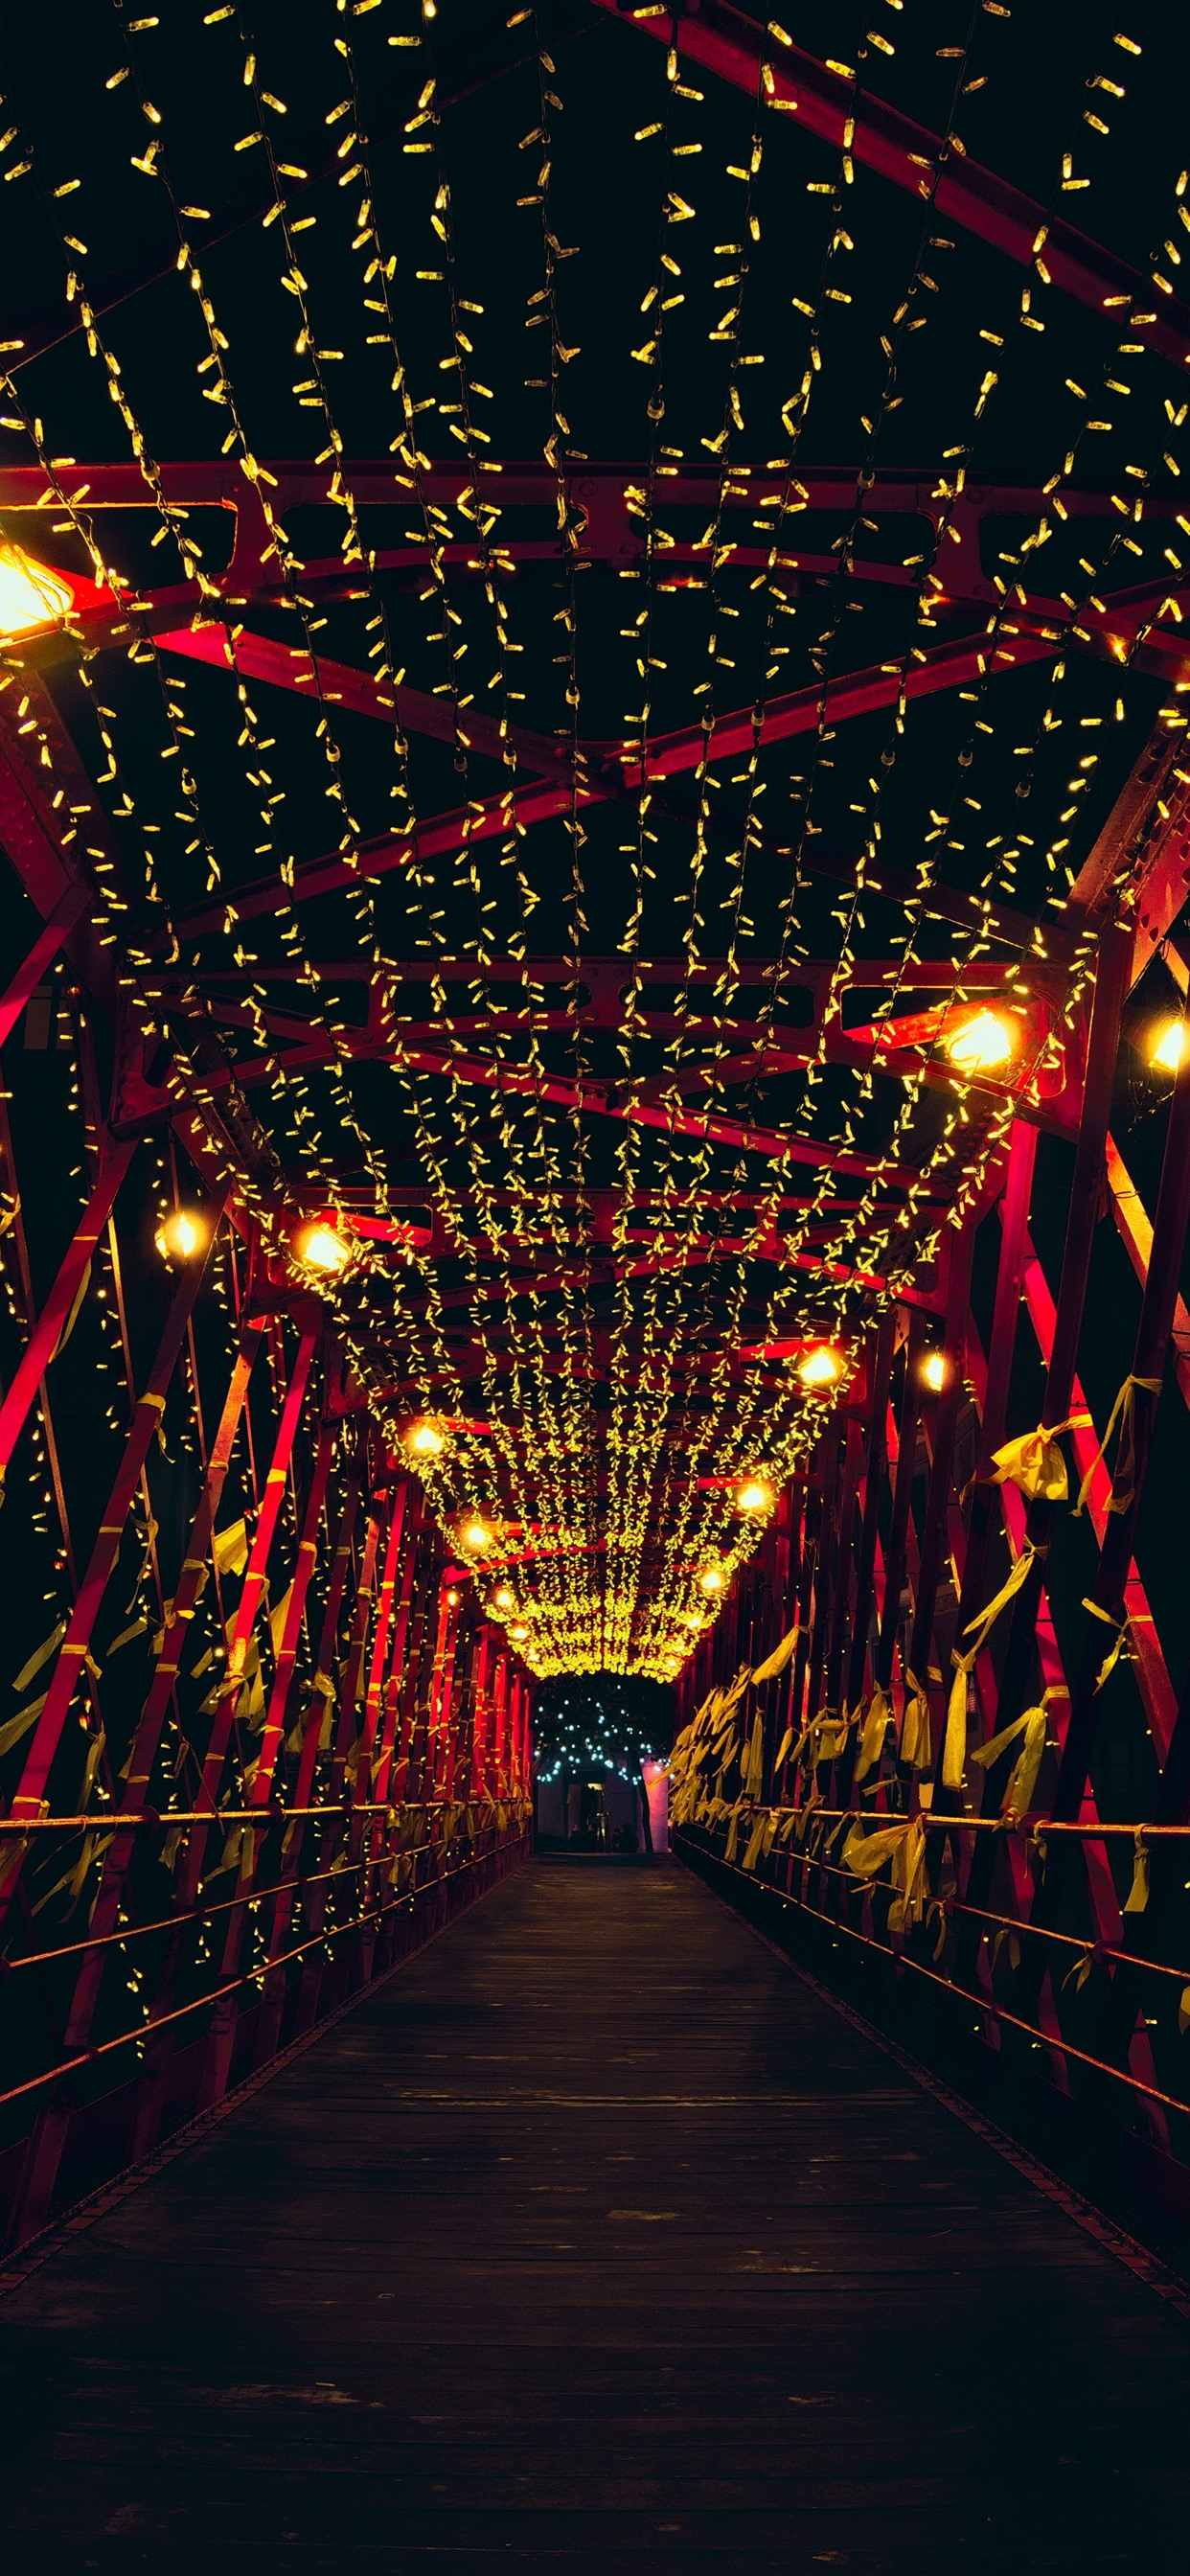 Wallpaper Bridge Night Lights Holiday 2880x1800 Hd Picture Image